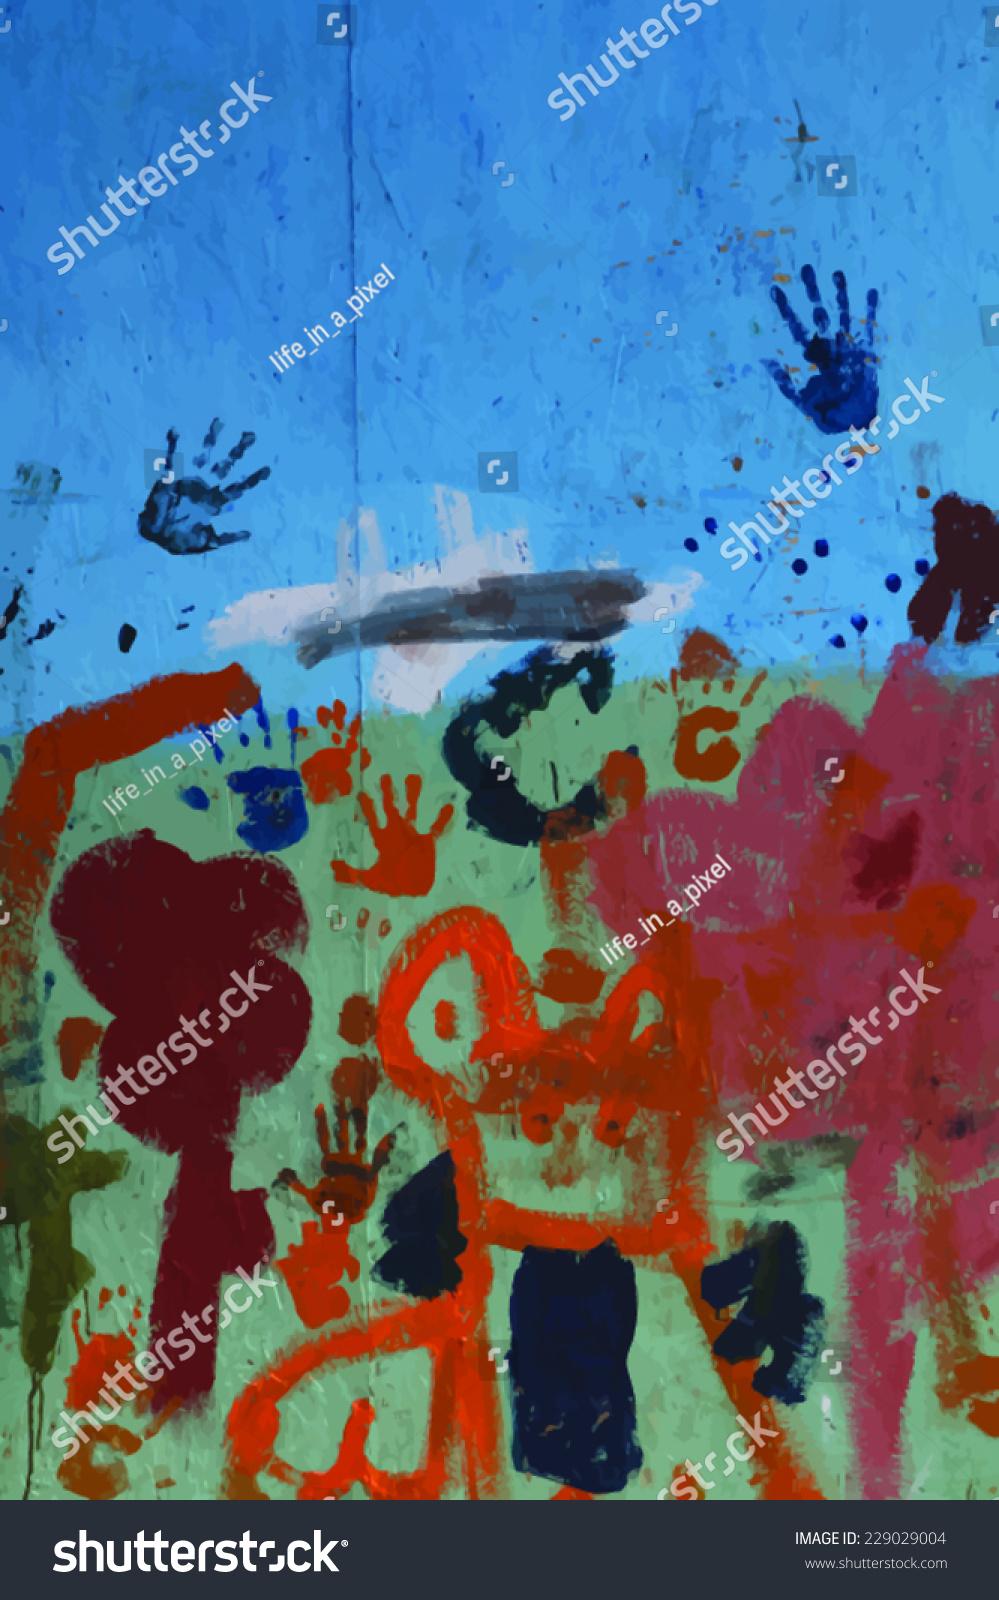 Graffiti wall vector free - Graffiti Wall Vector Background